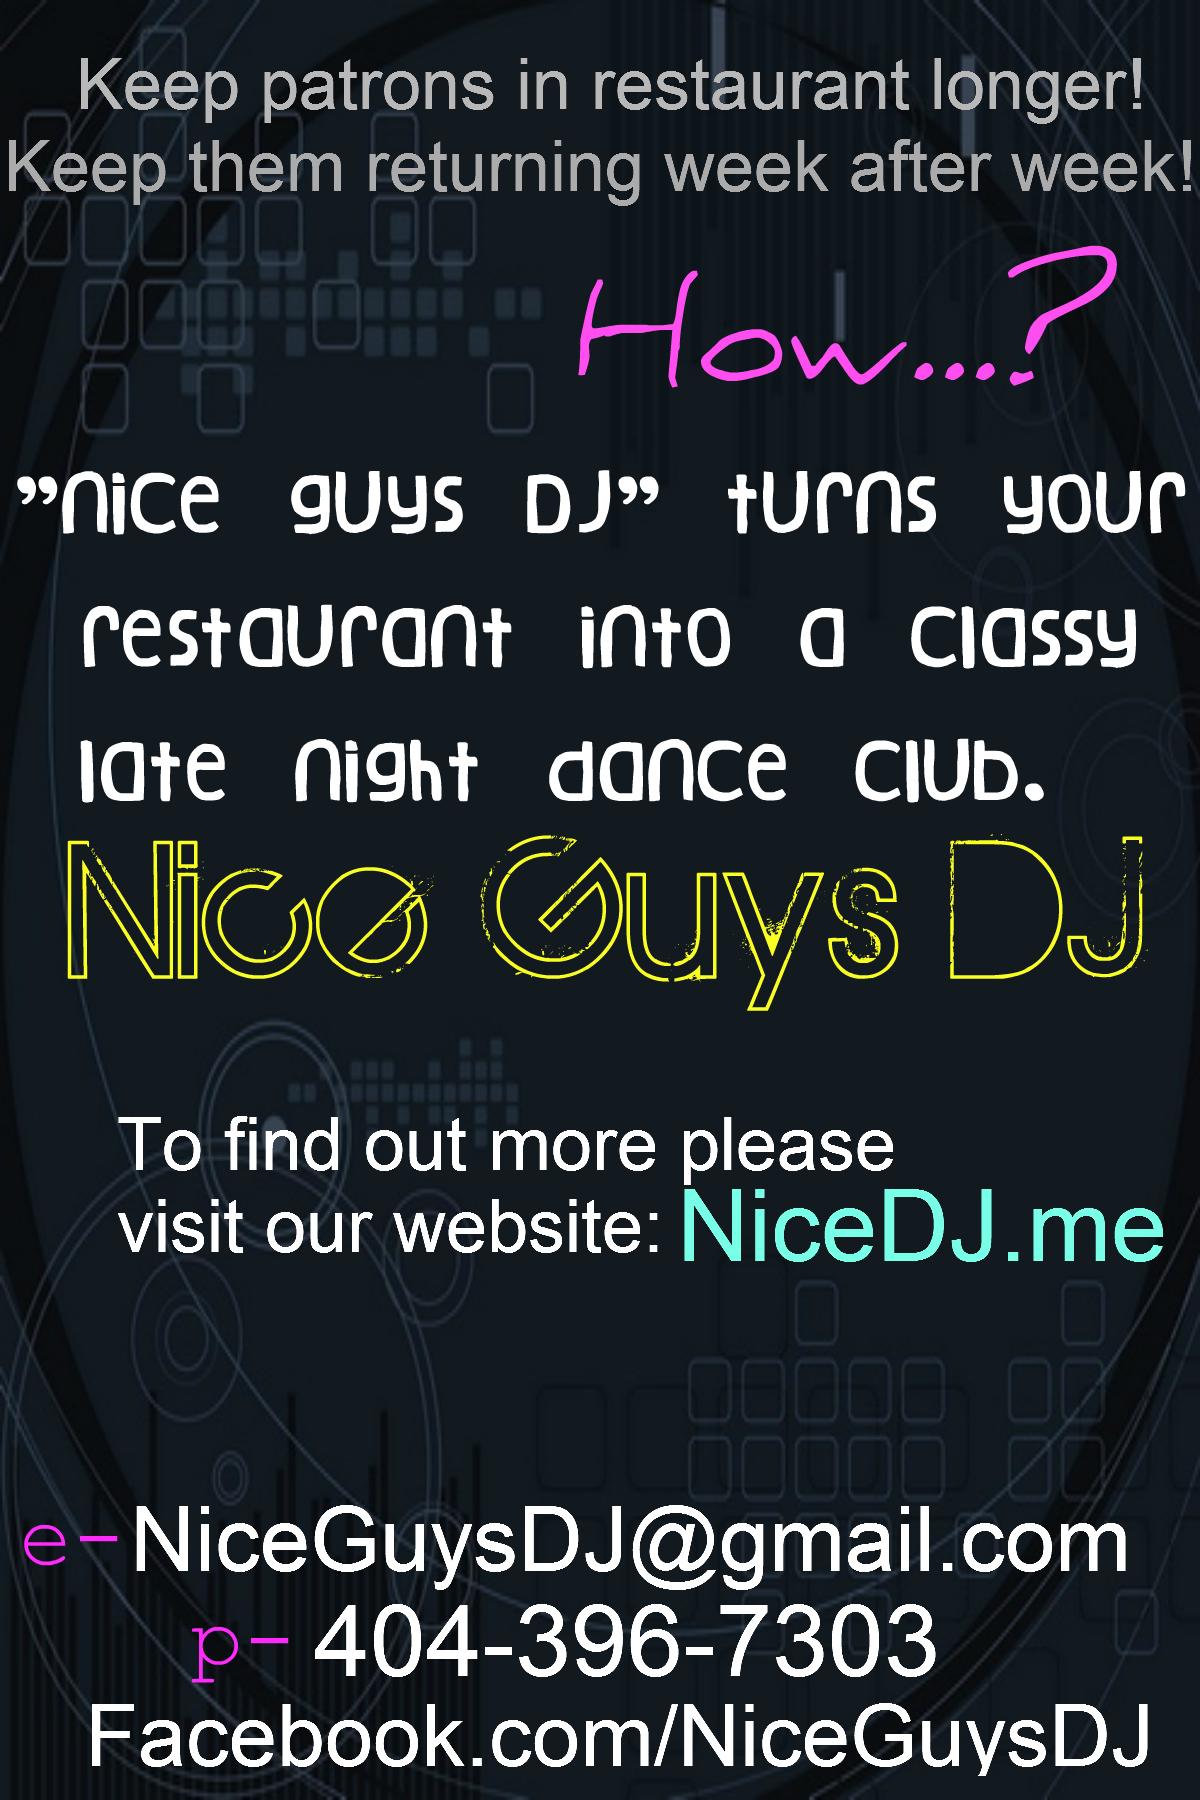 Nice Guys DJ turns your restaurant into a classy late night dance club